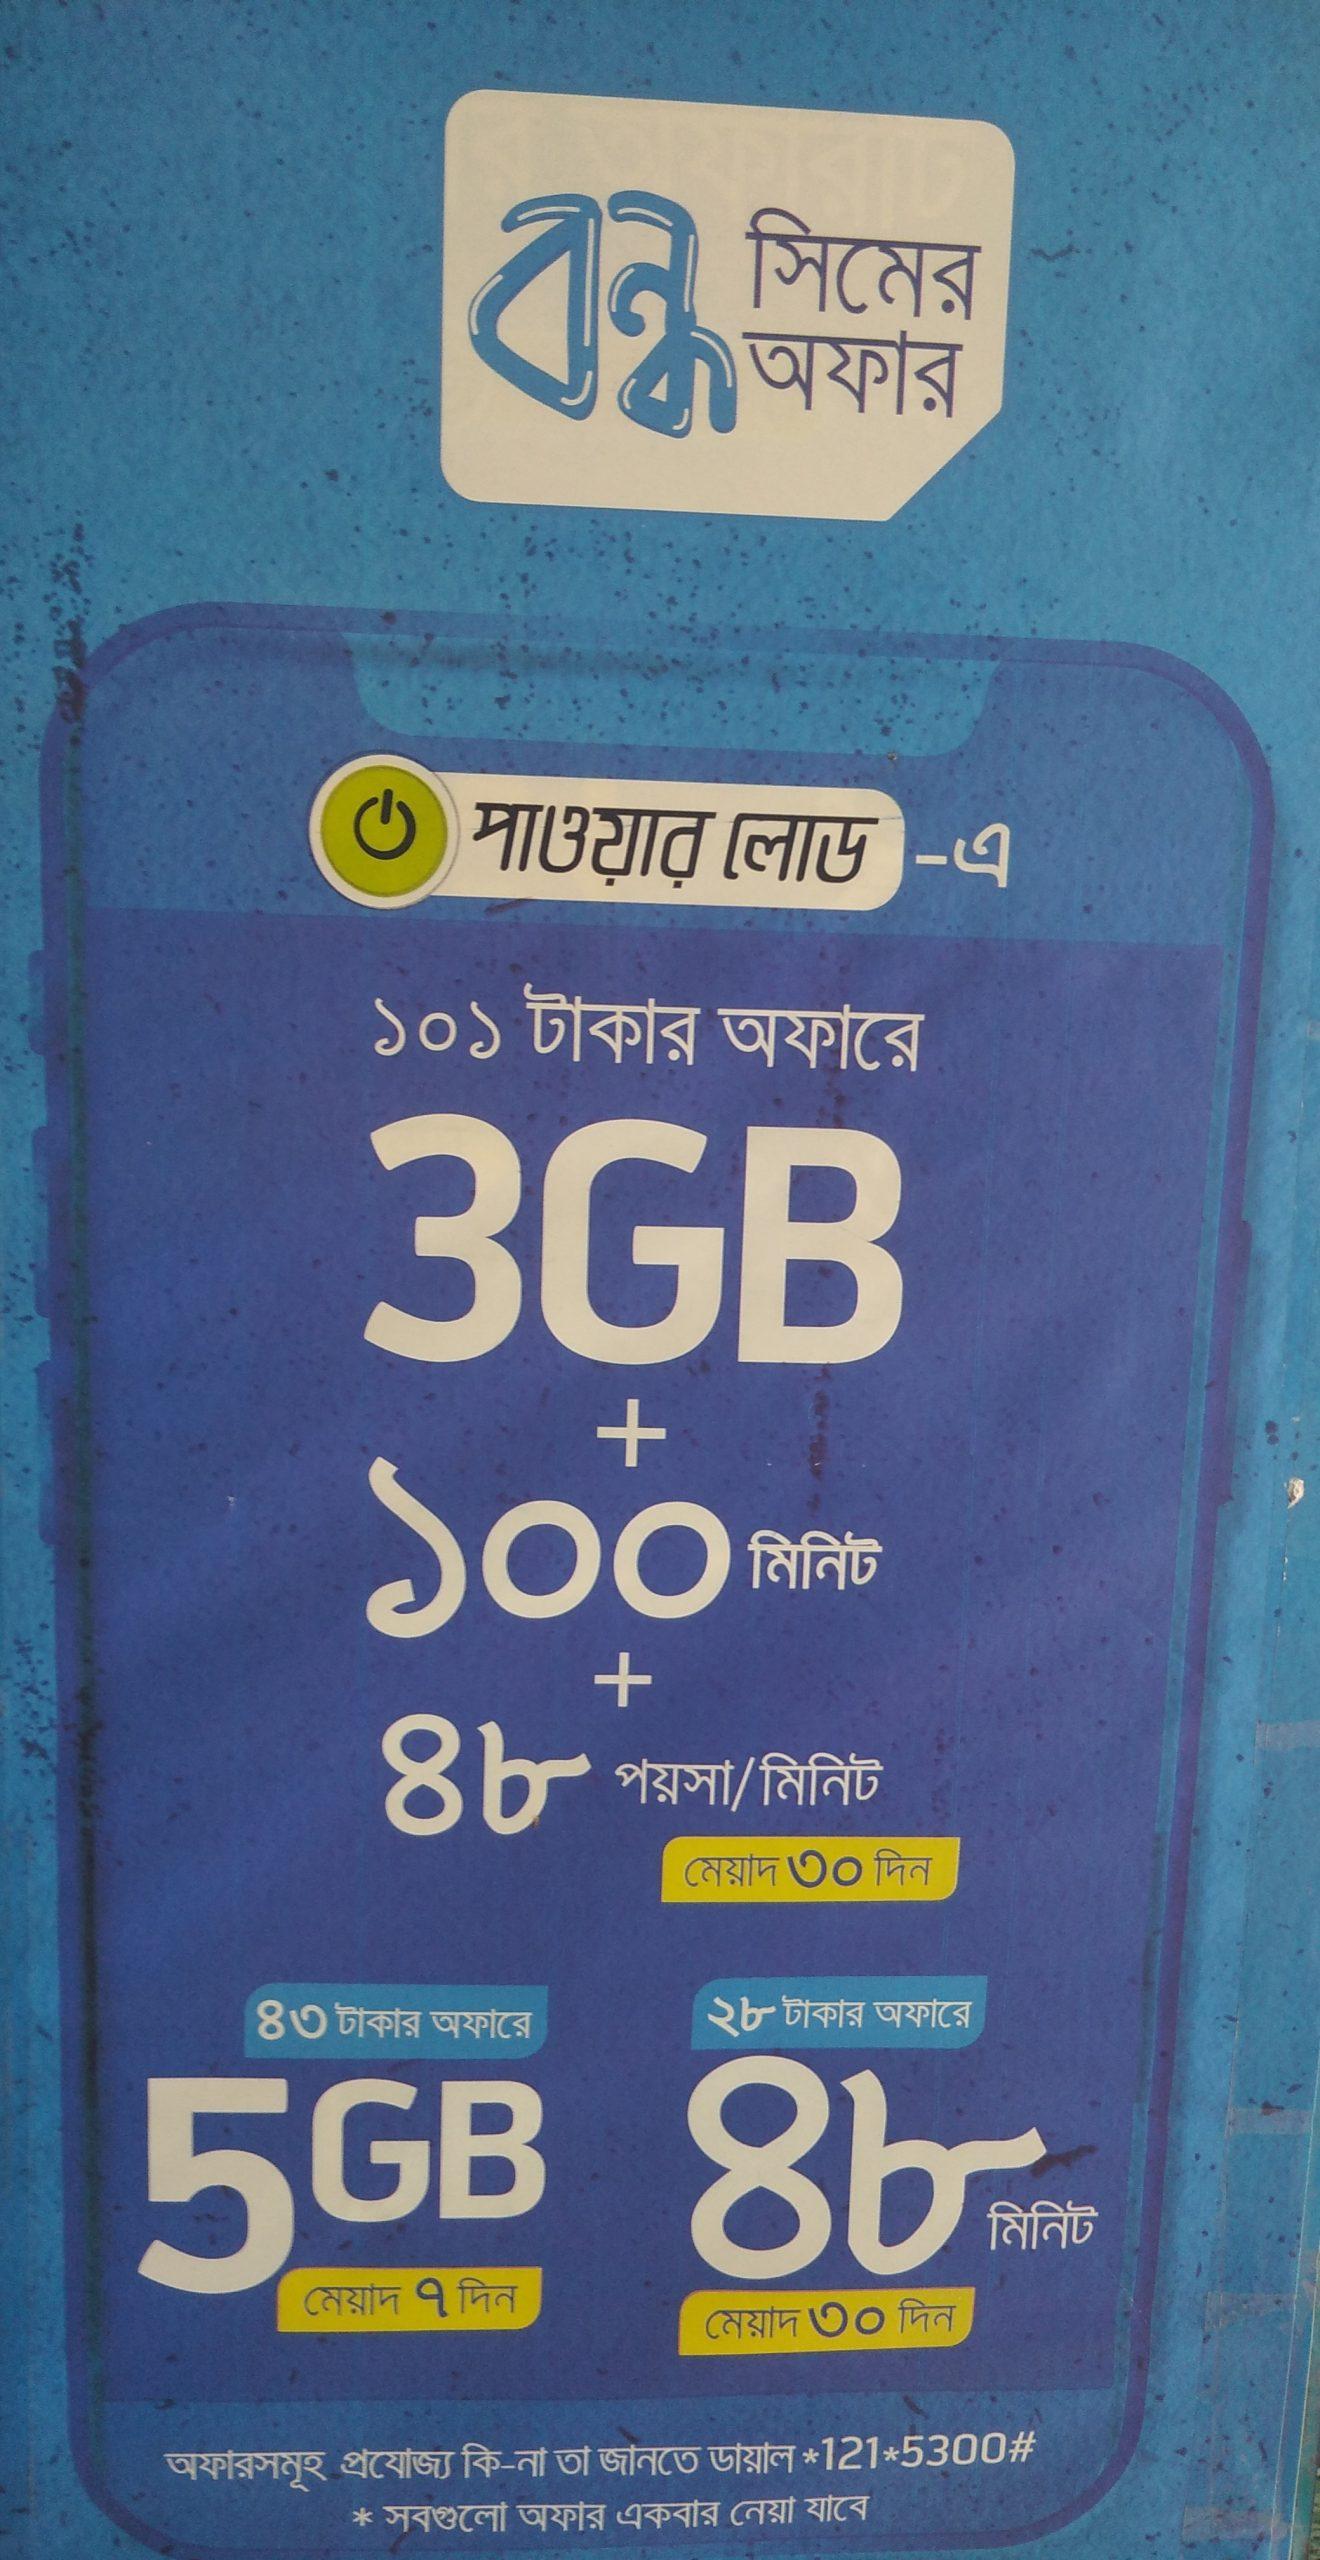 GP 9 taka 1 GB Offer